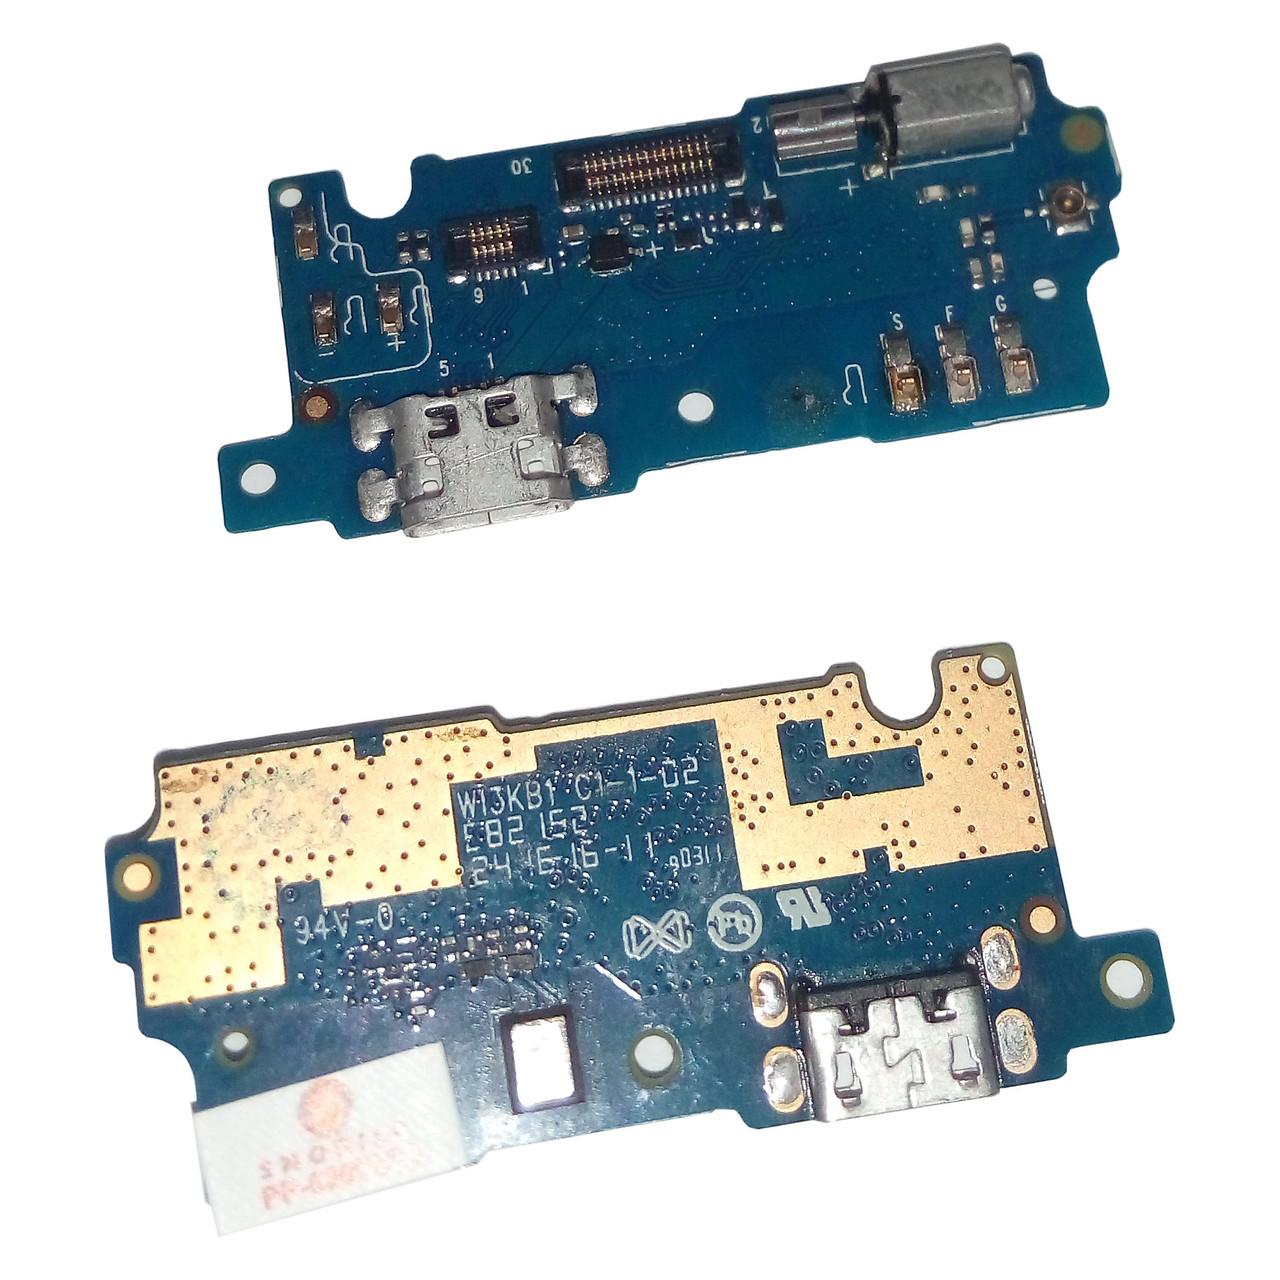 Шлейф разъема зарядки для Meizu M3s, M3s Mini с микрофоном